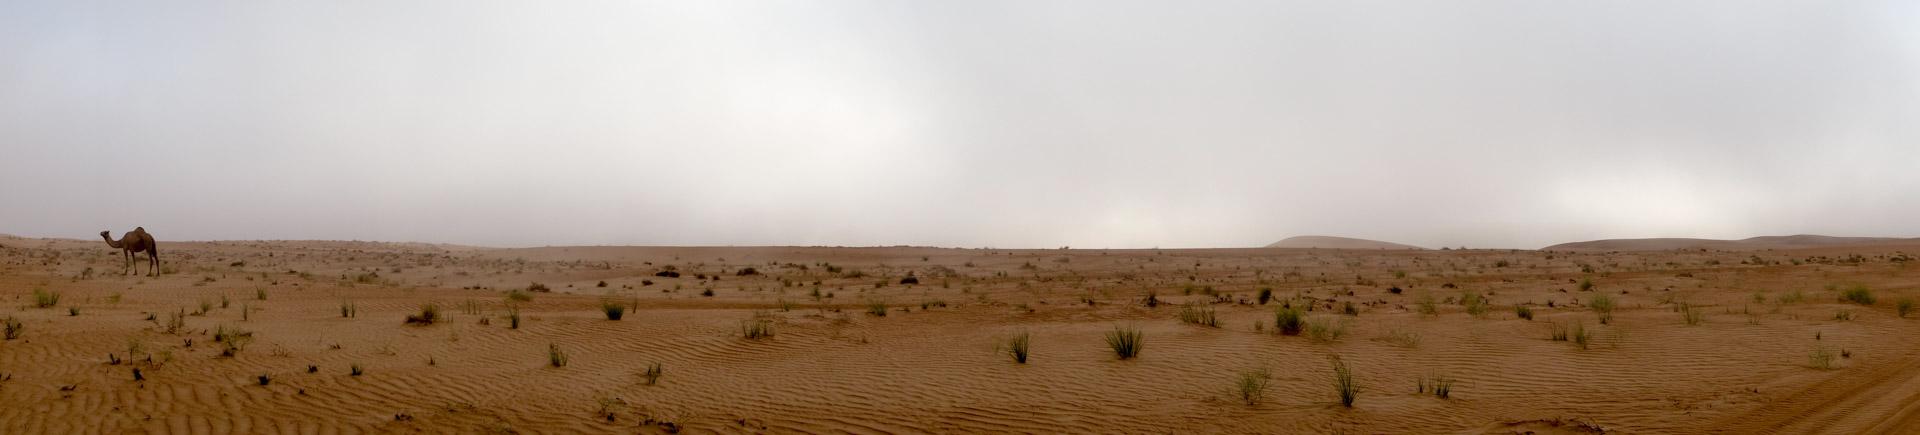 "A ""wild"" camel in the desert."